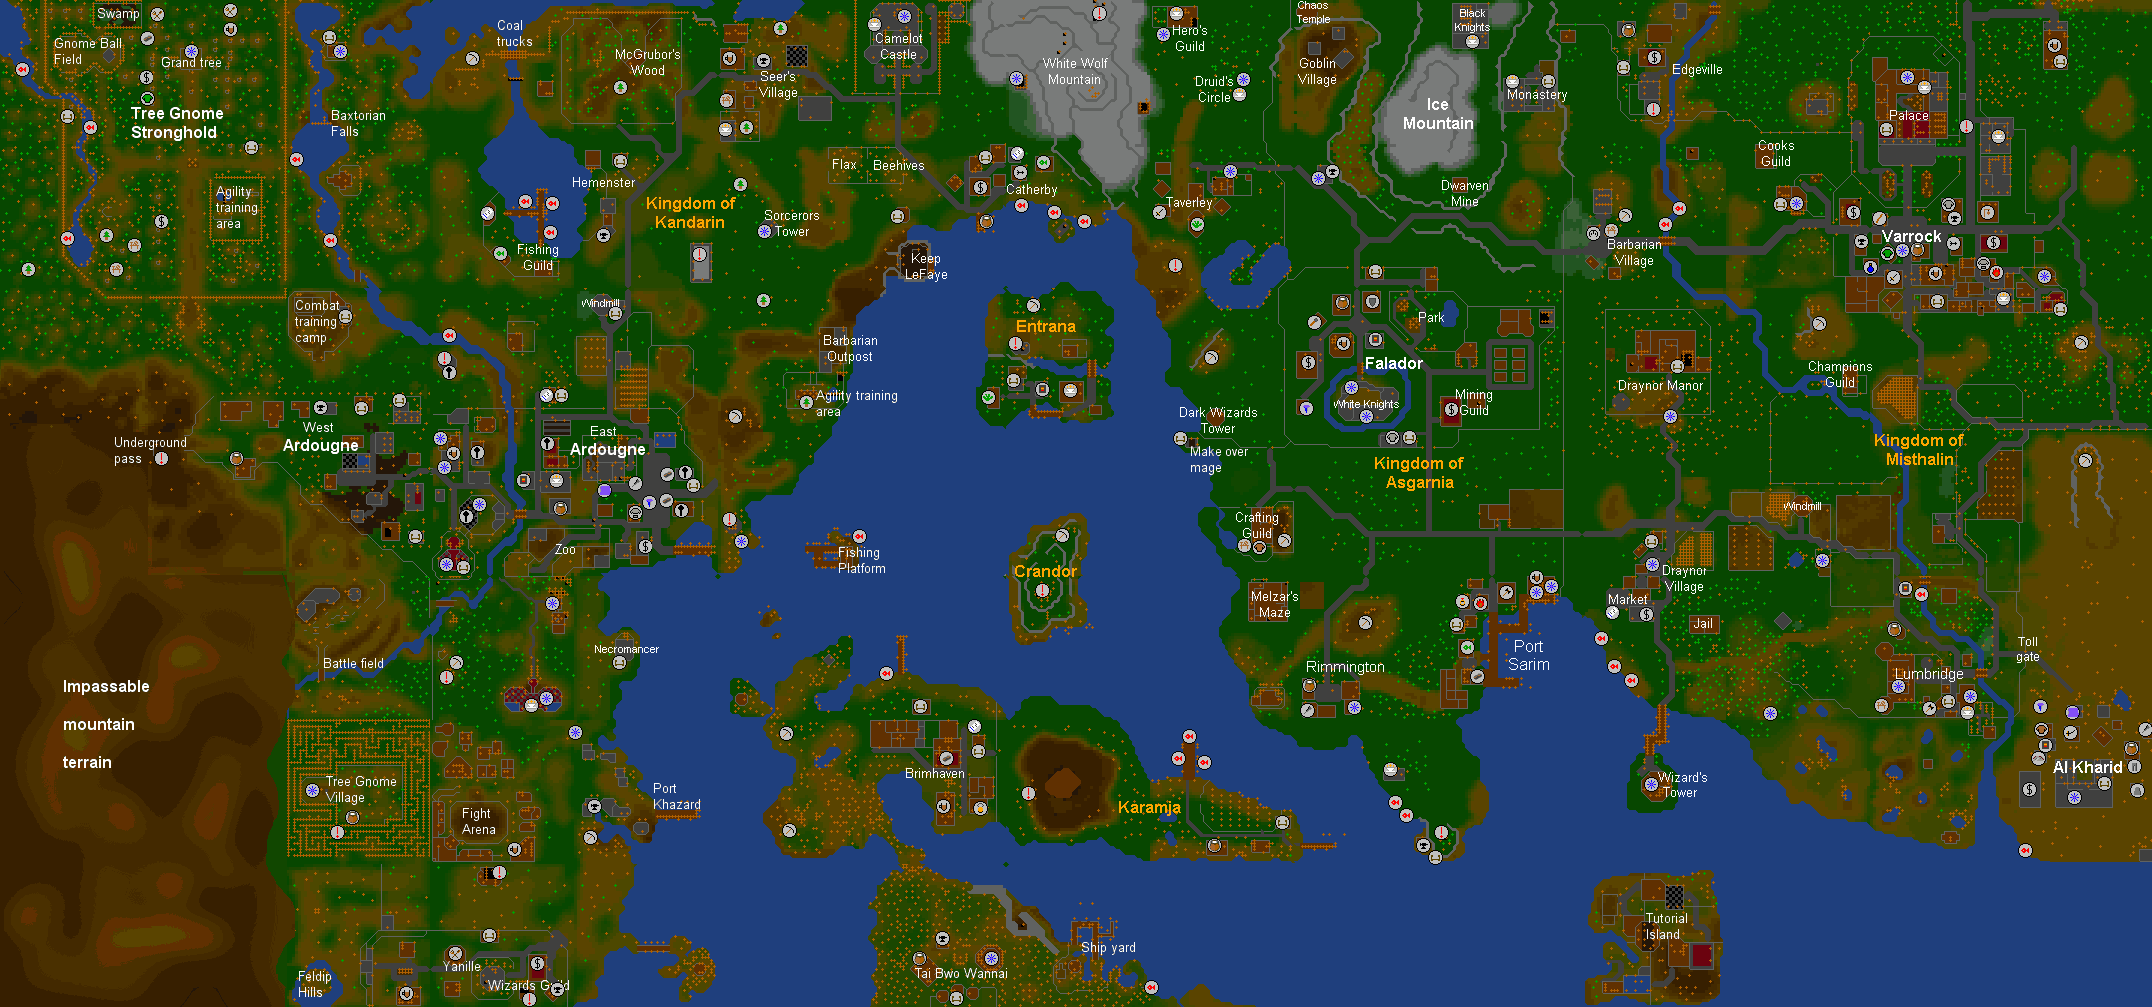 Runescape Classic World Map | Global Map